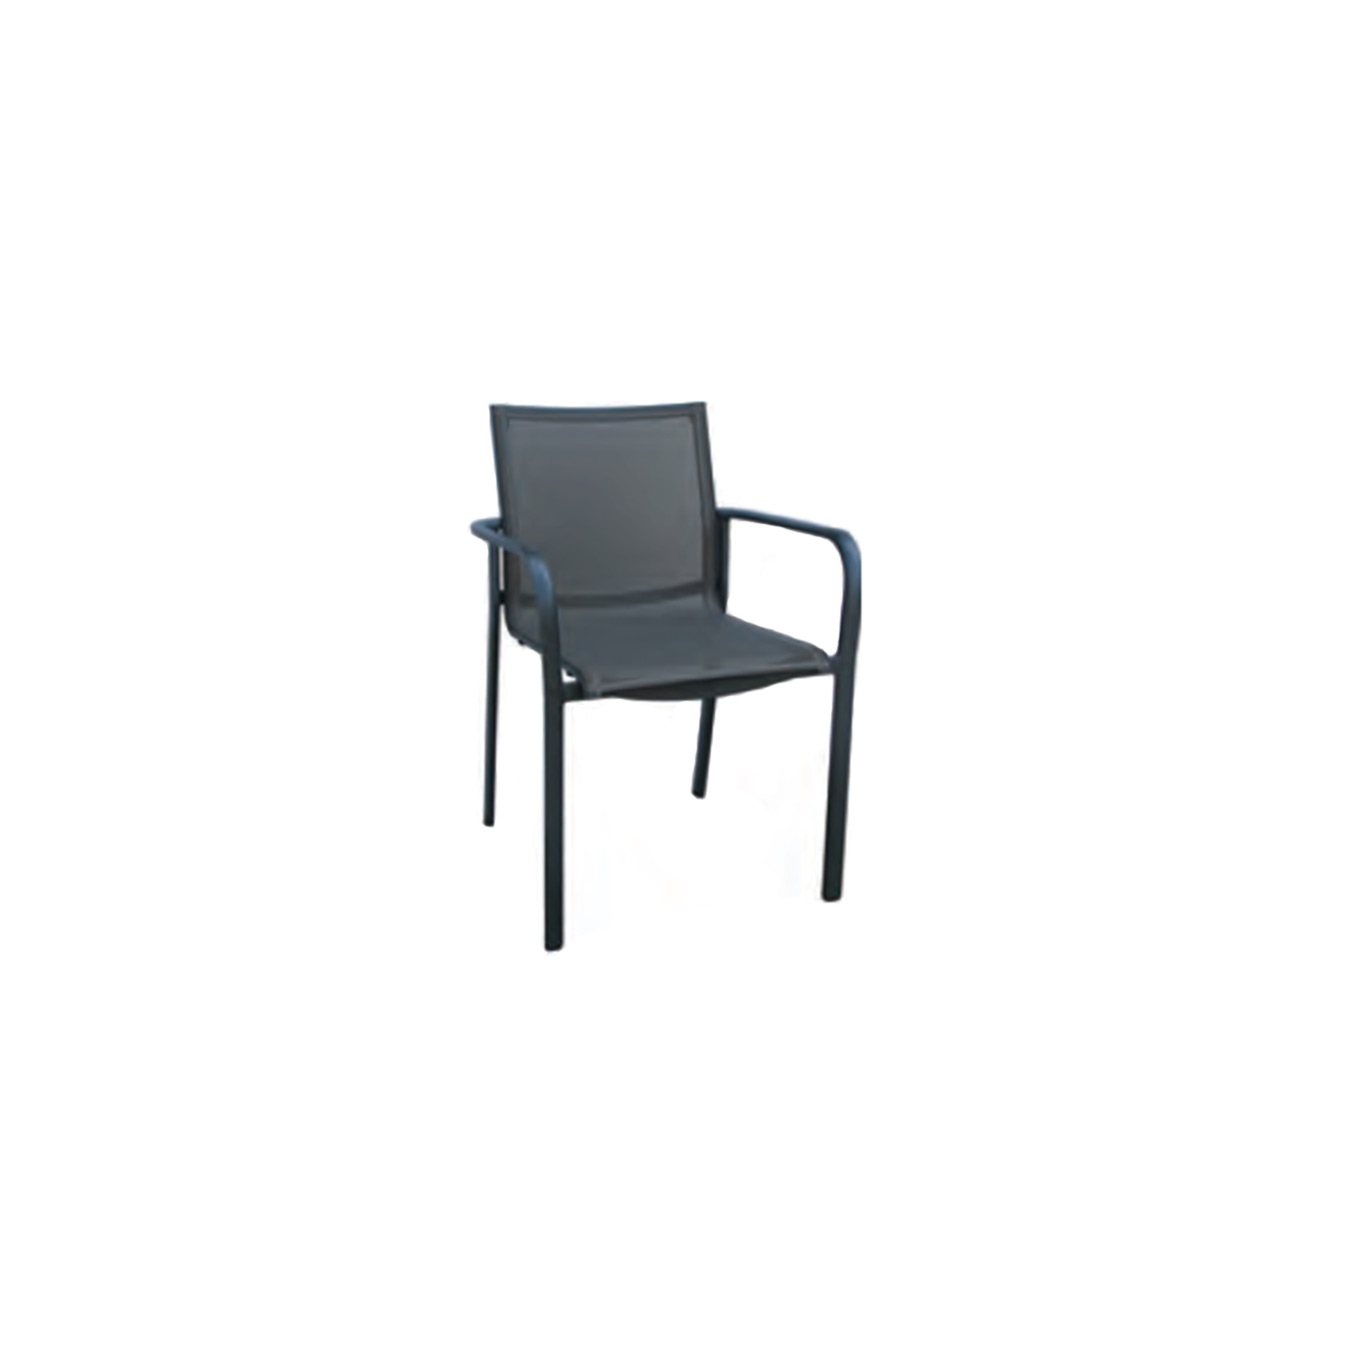 Les Jardins Hegoa Stacking Arm Chair - Leisure Living